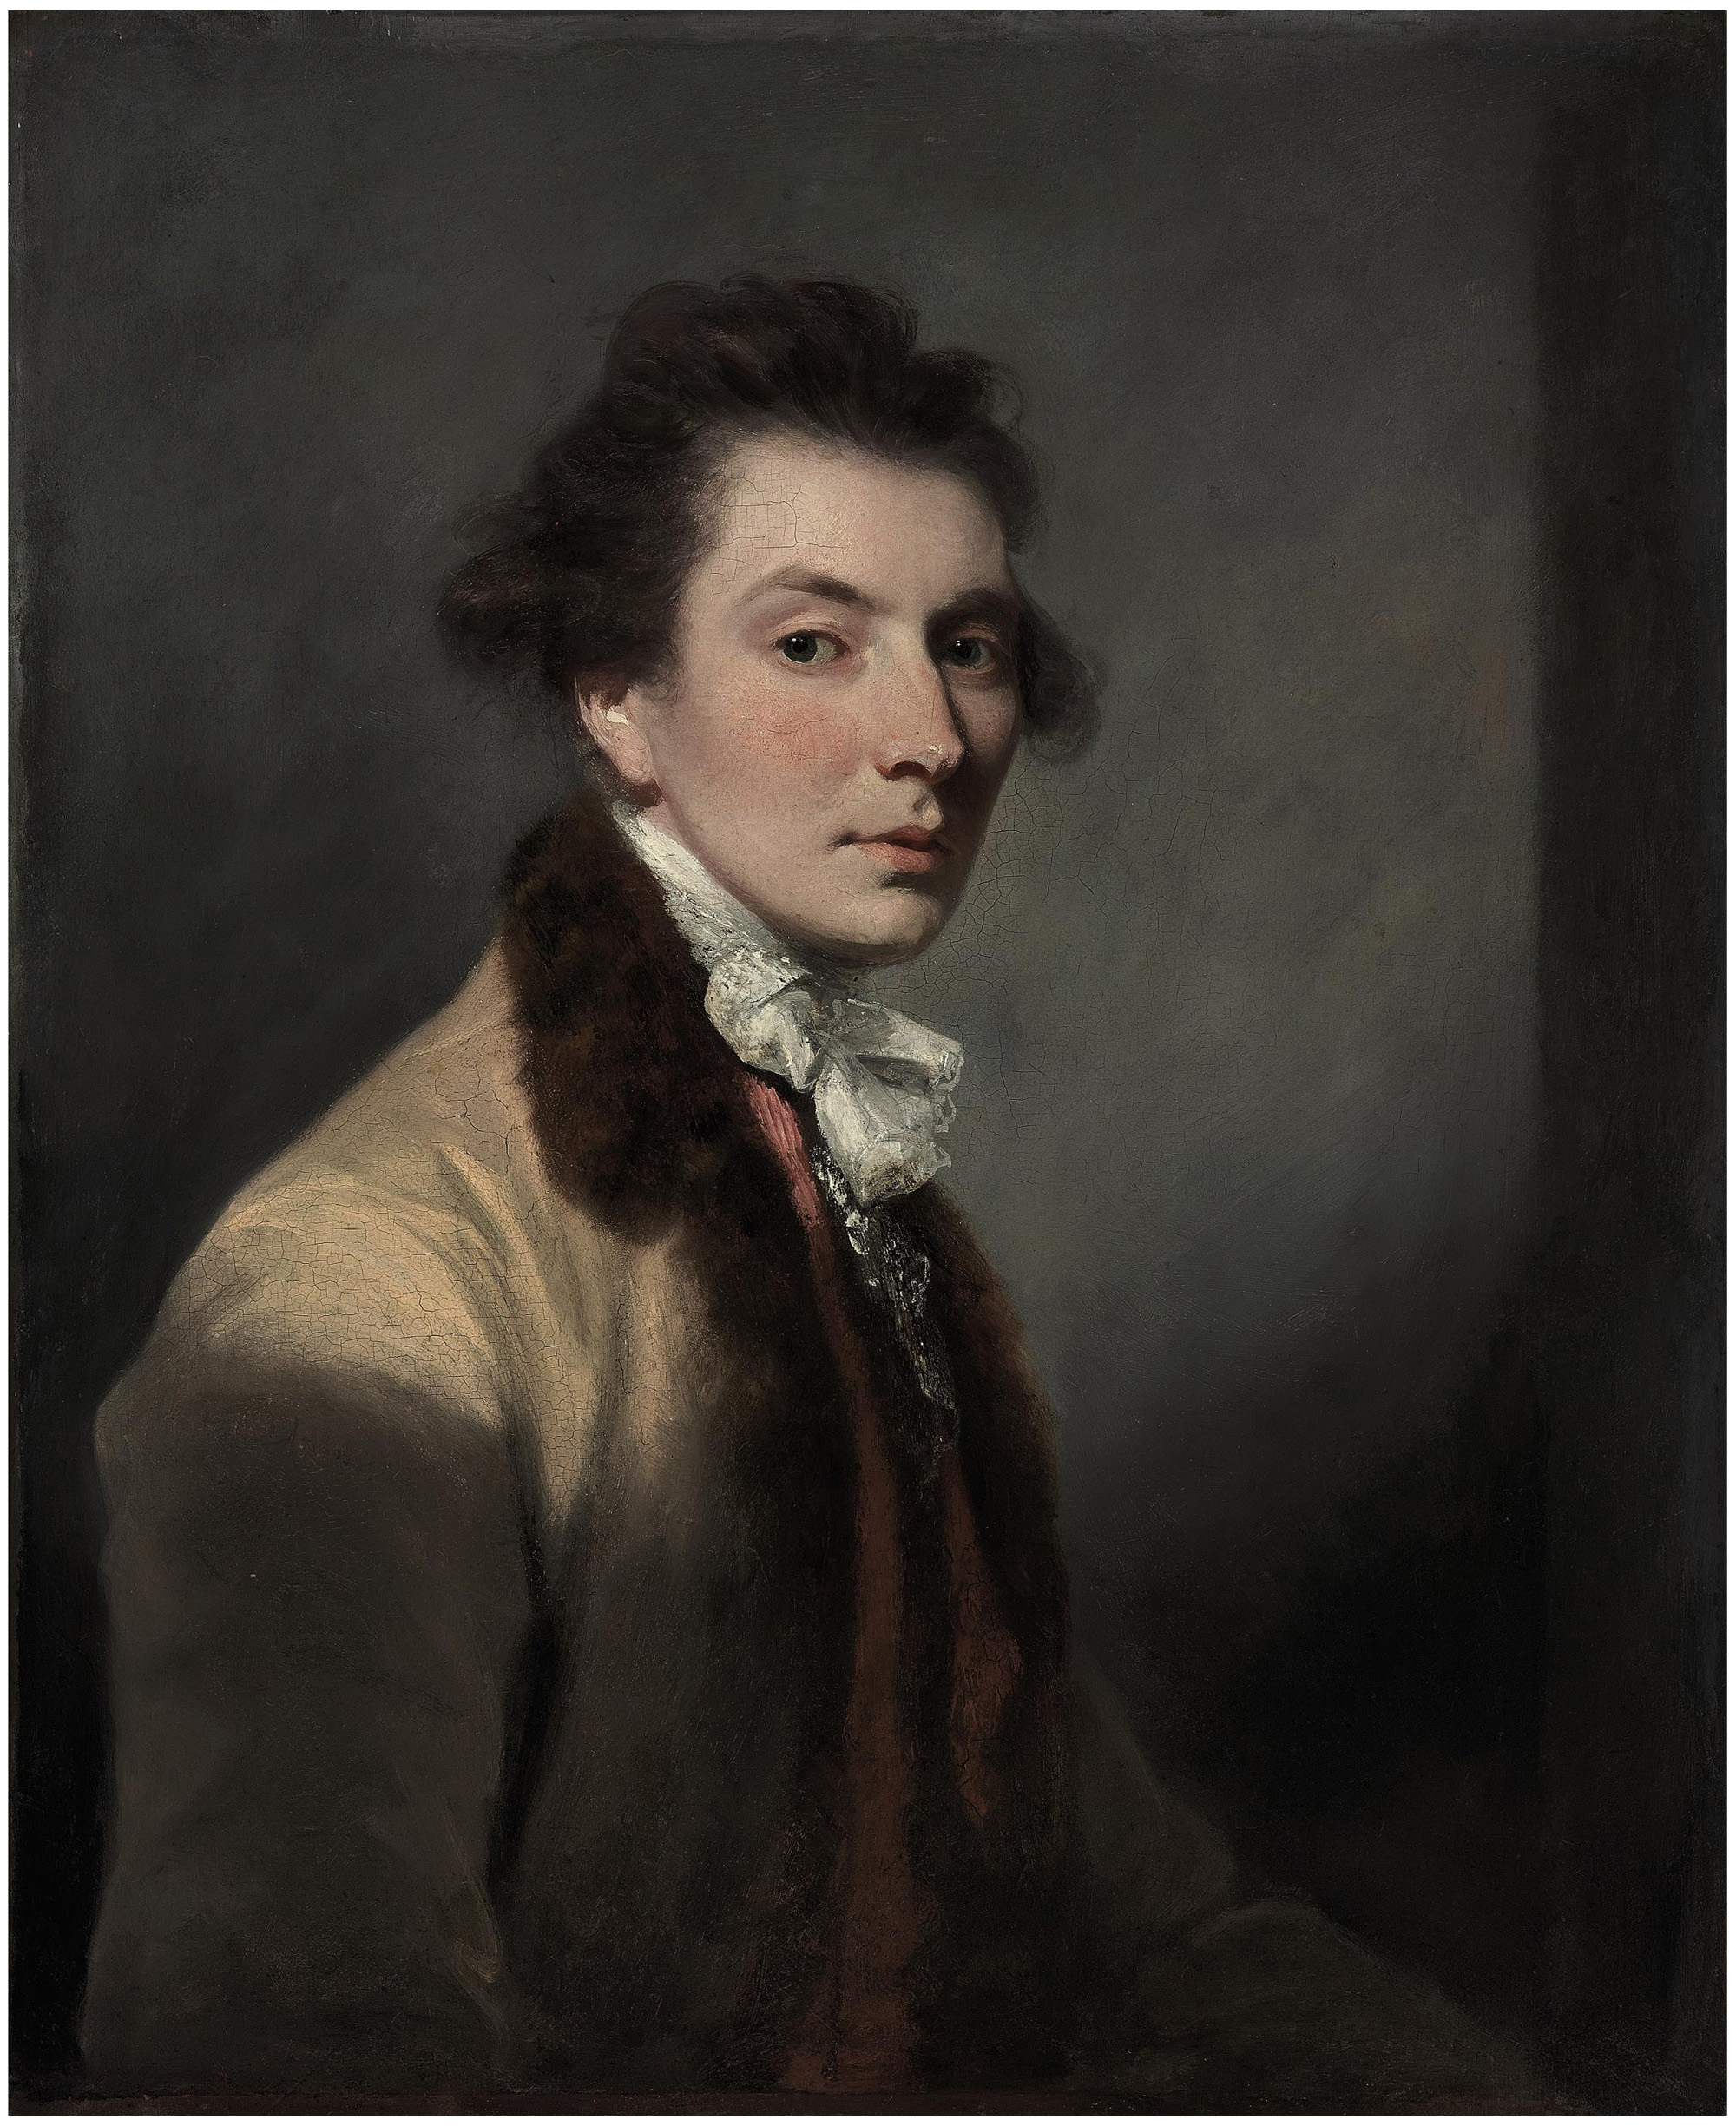 Sir Joshua Reynolds, P.R.A. (Plympton, Devon 1723-1792 London)